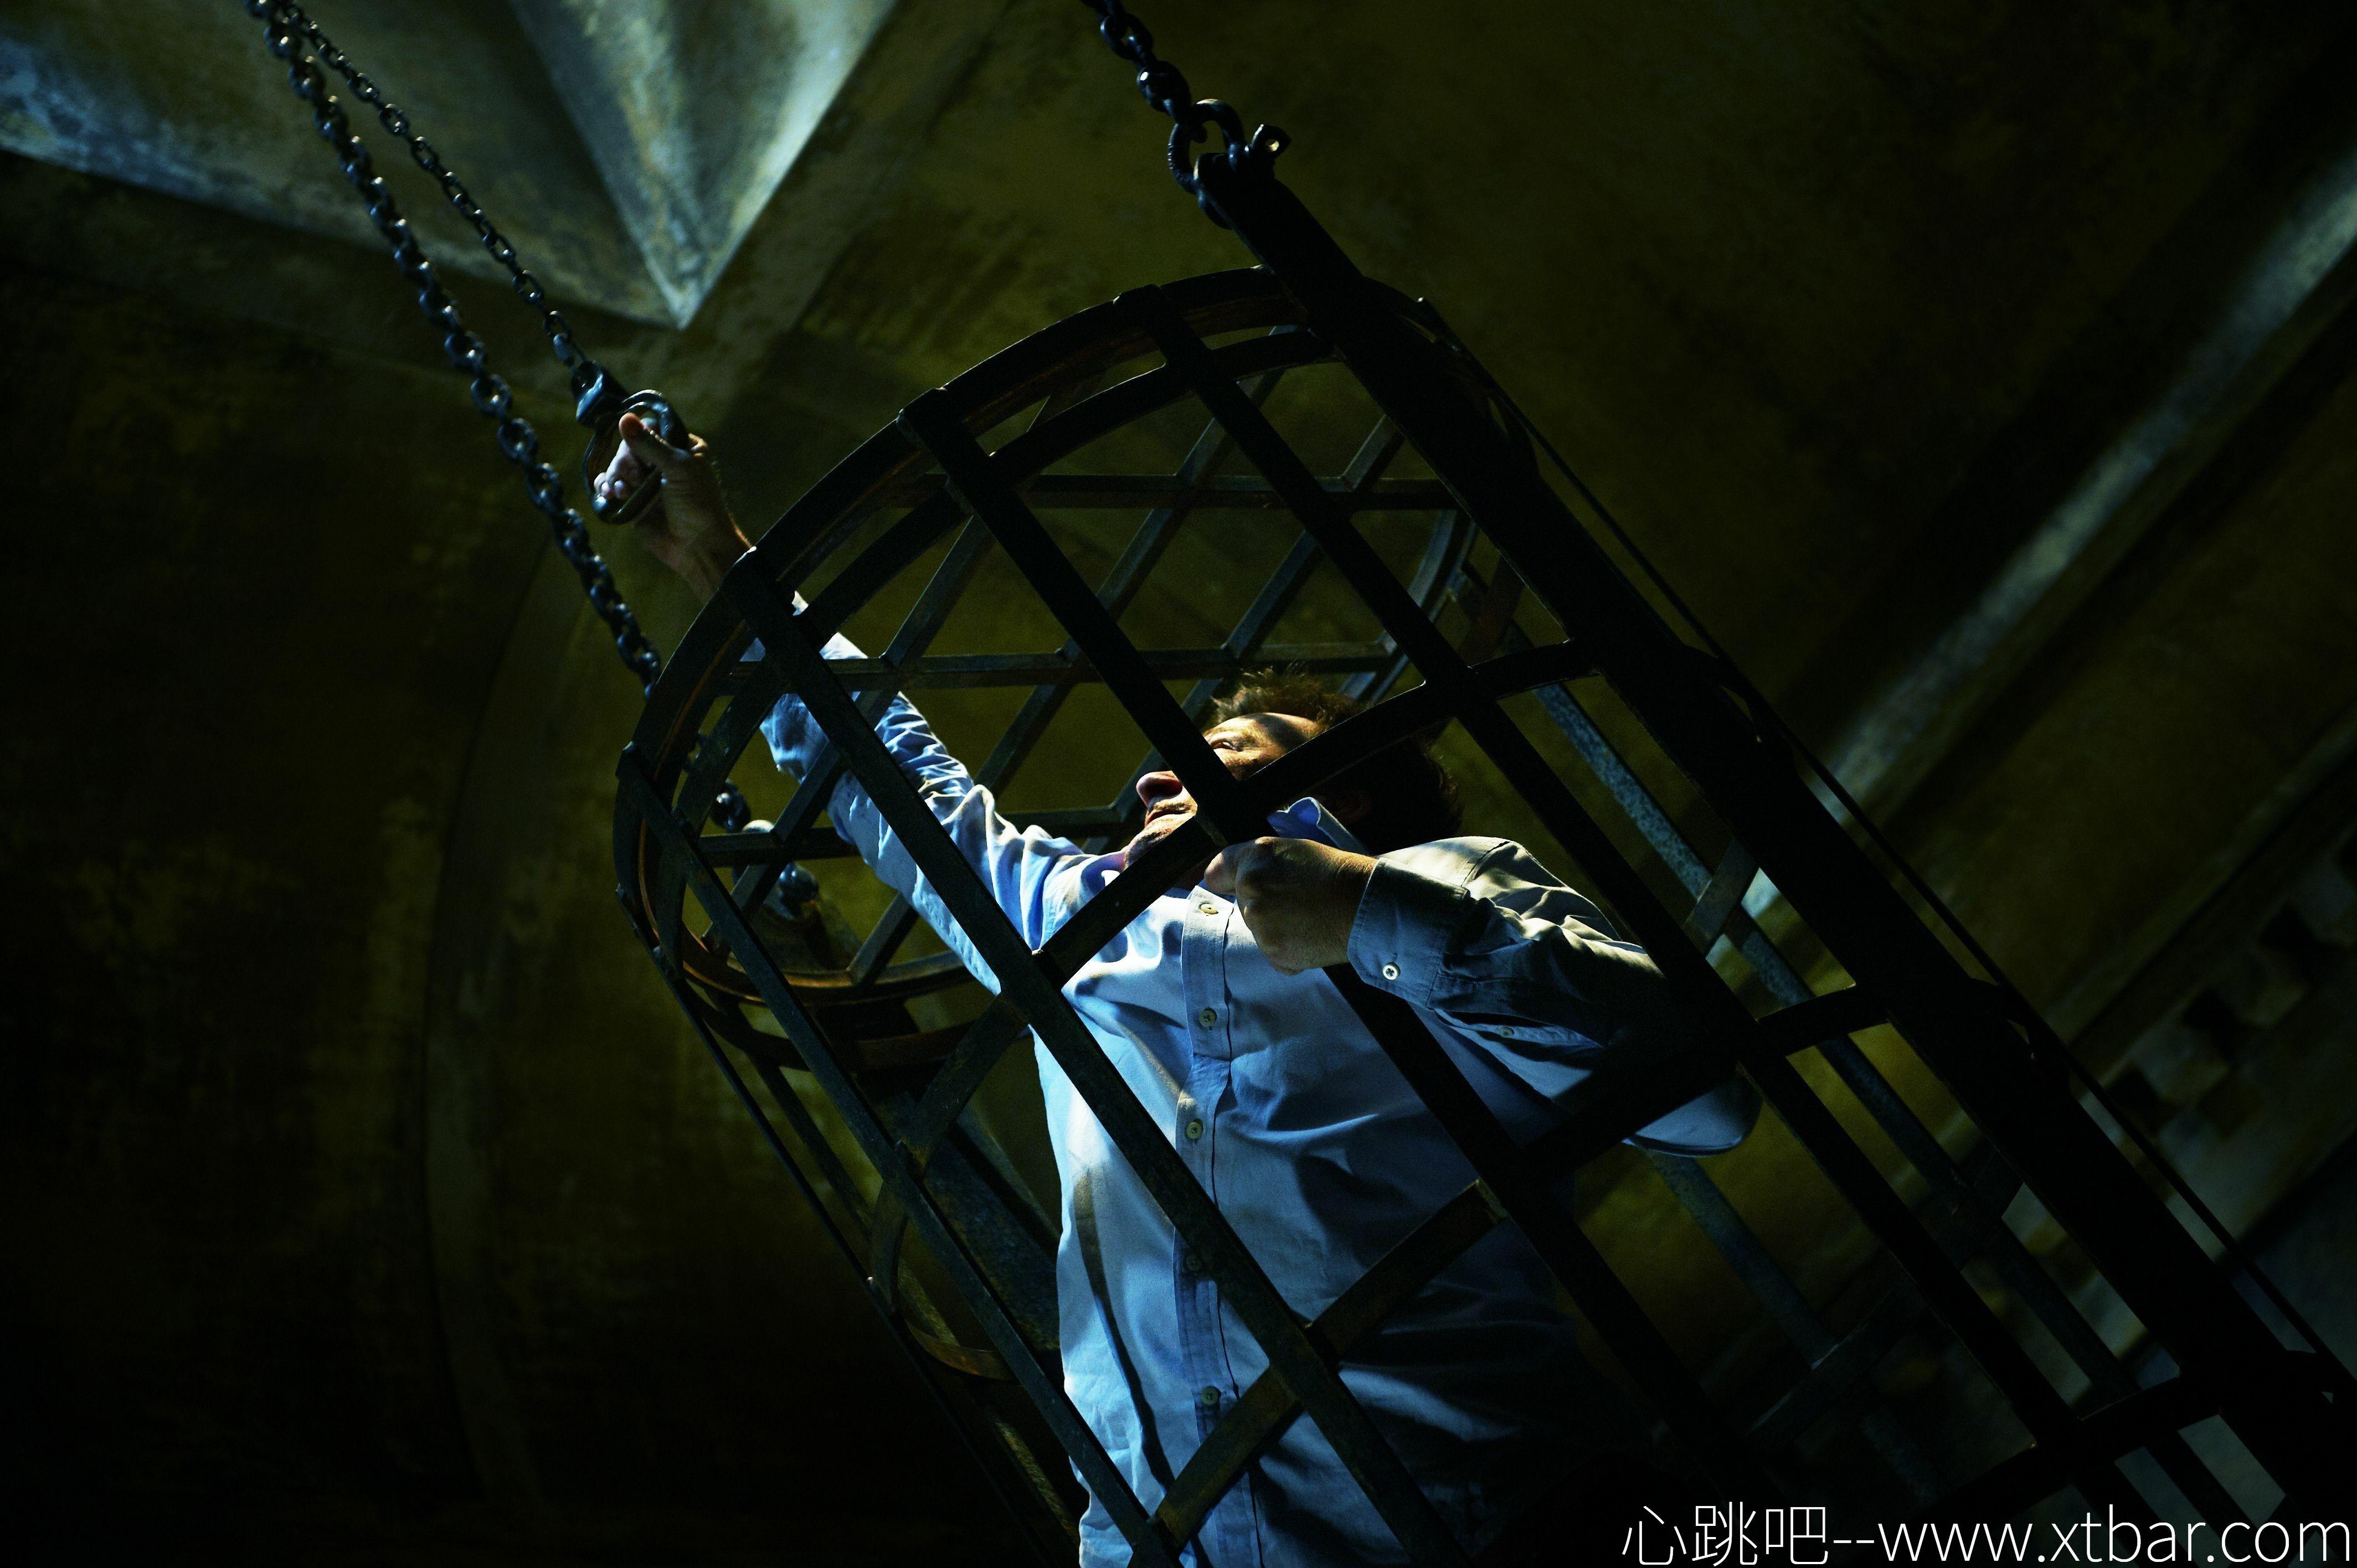 0085j6oIly1gj5lonyhm5j33a826o1kx - [心跳吧国庆恐怖片推荐]:《电锯惊魂7》,说是终章,只是总结而已!